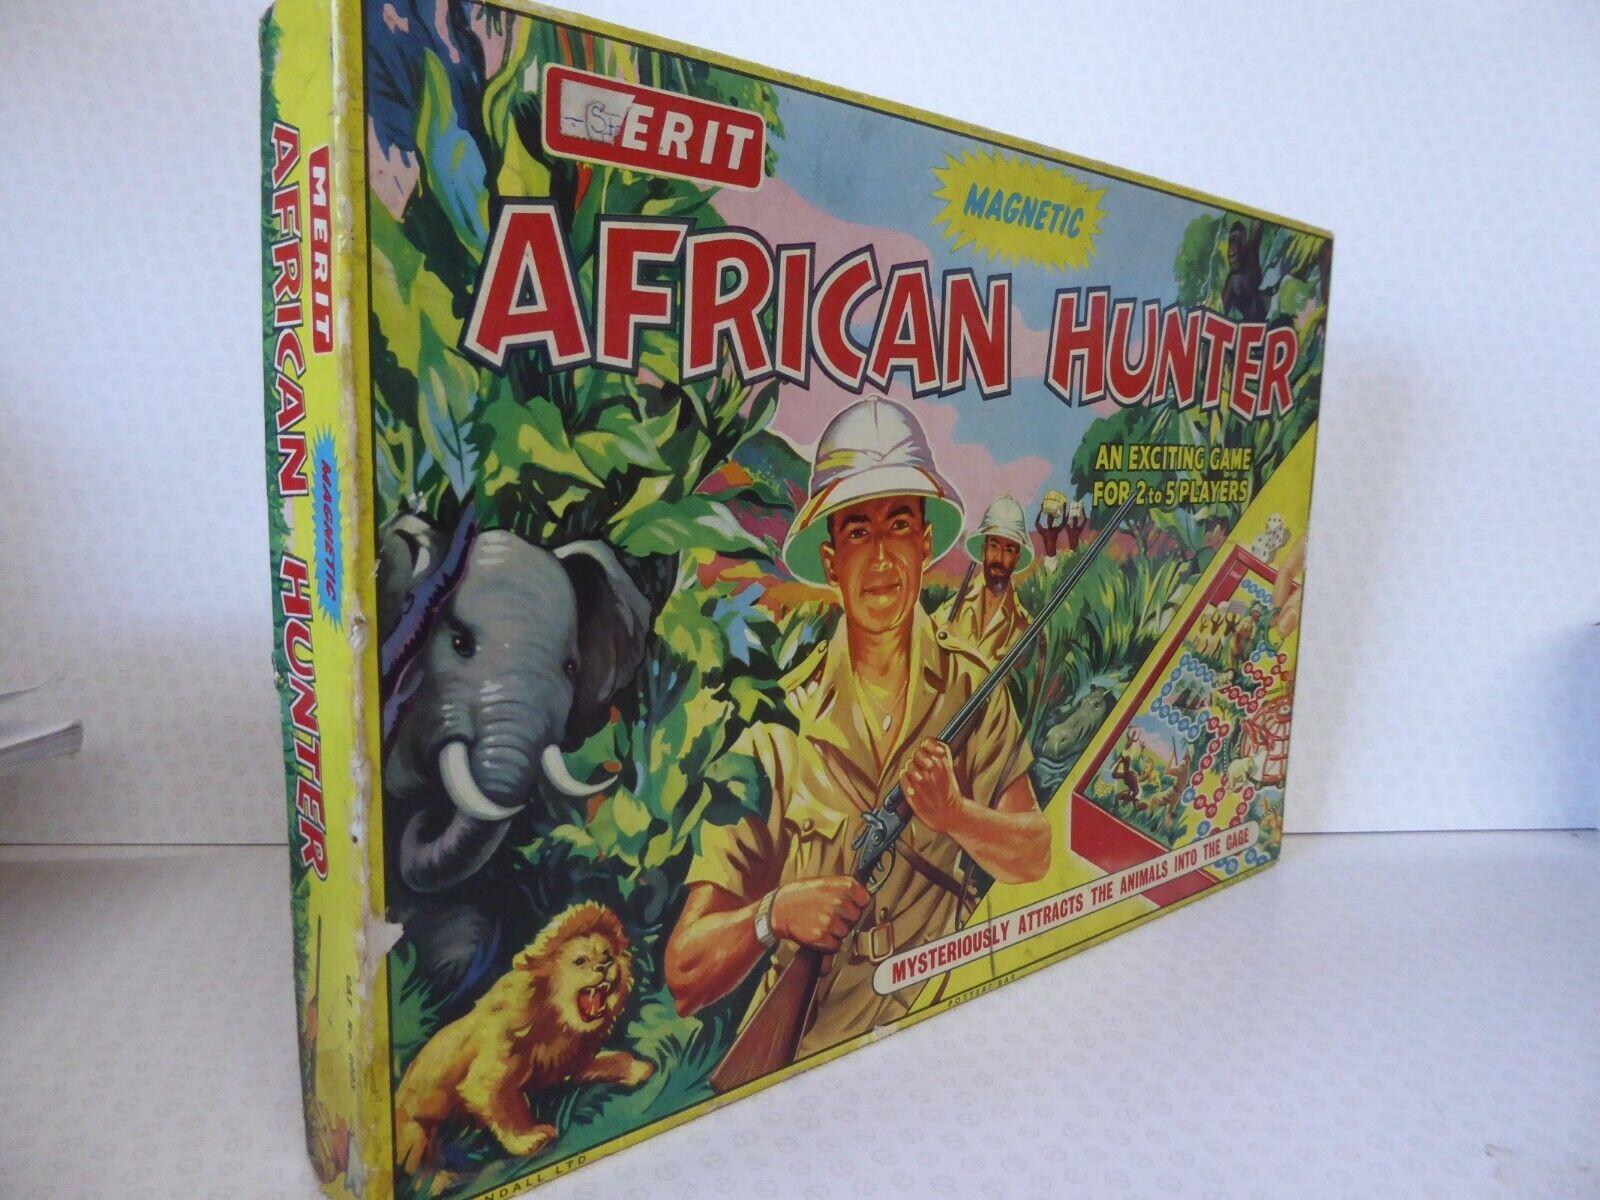 Vintage African Hunter magnétique jeu de plateau-mérite années 1950 ANGLETERRE